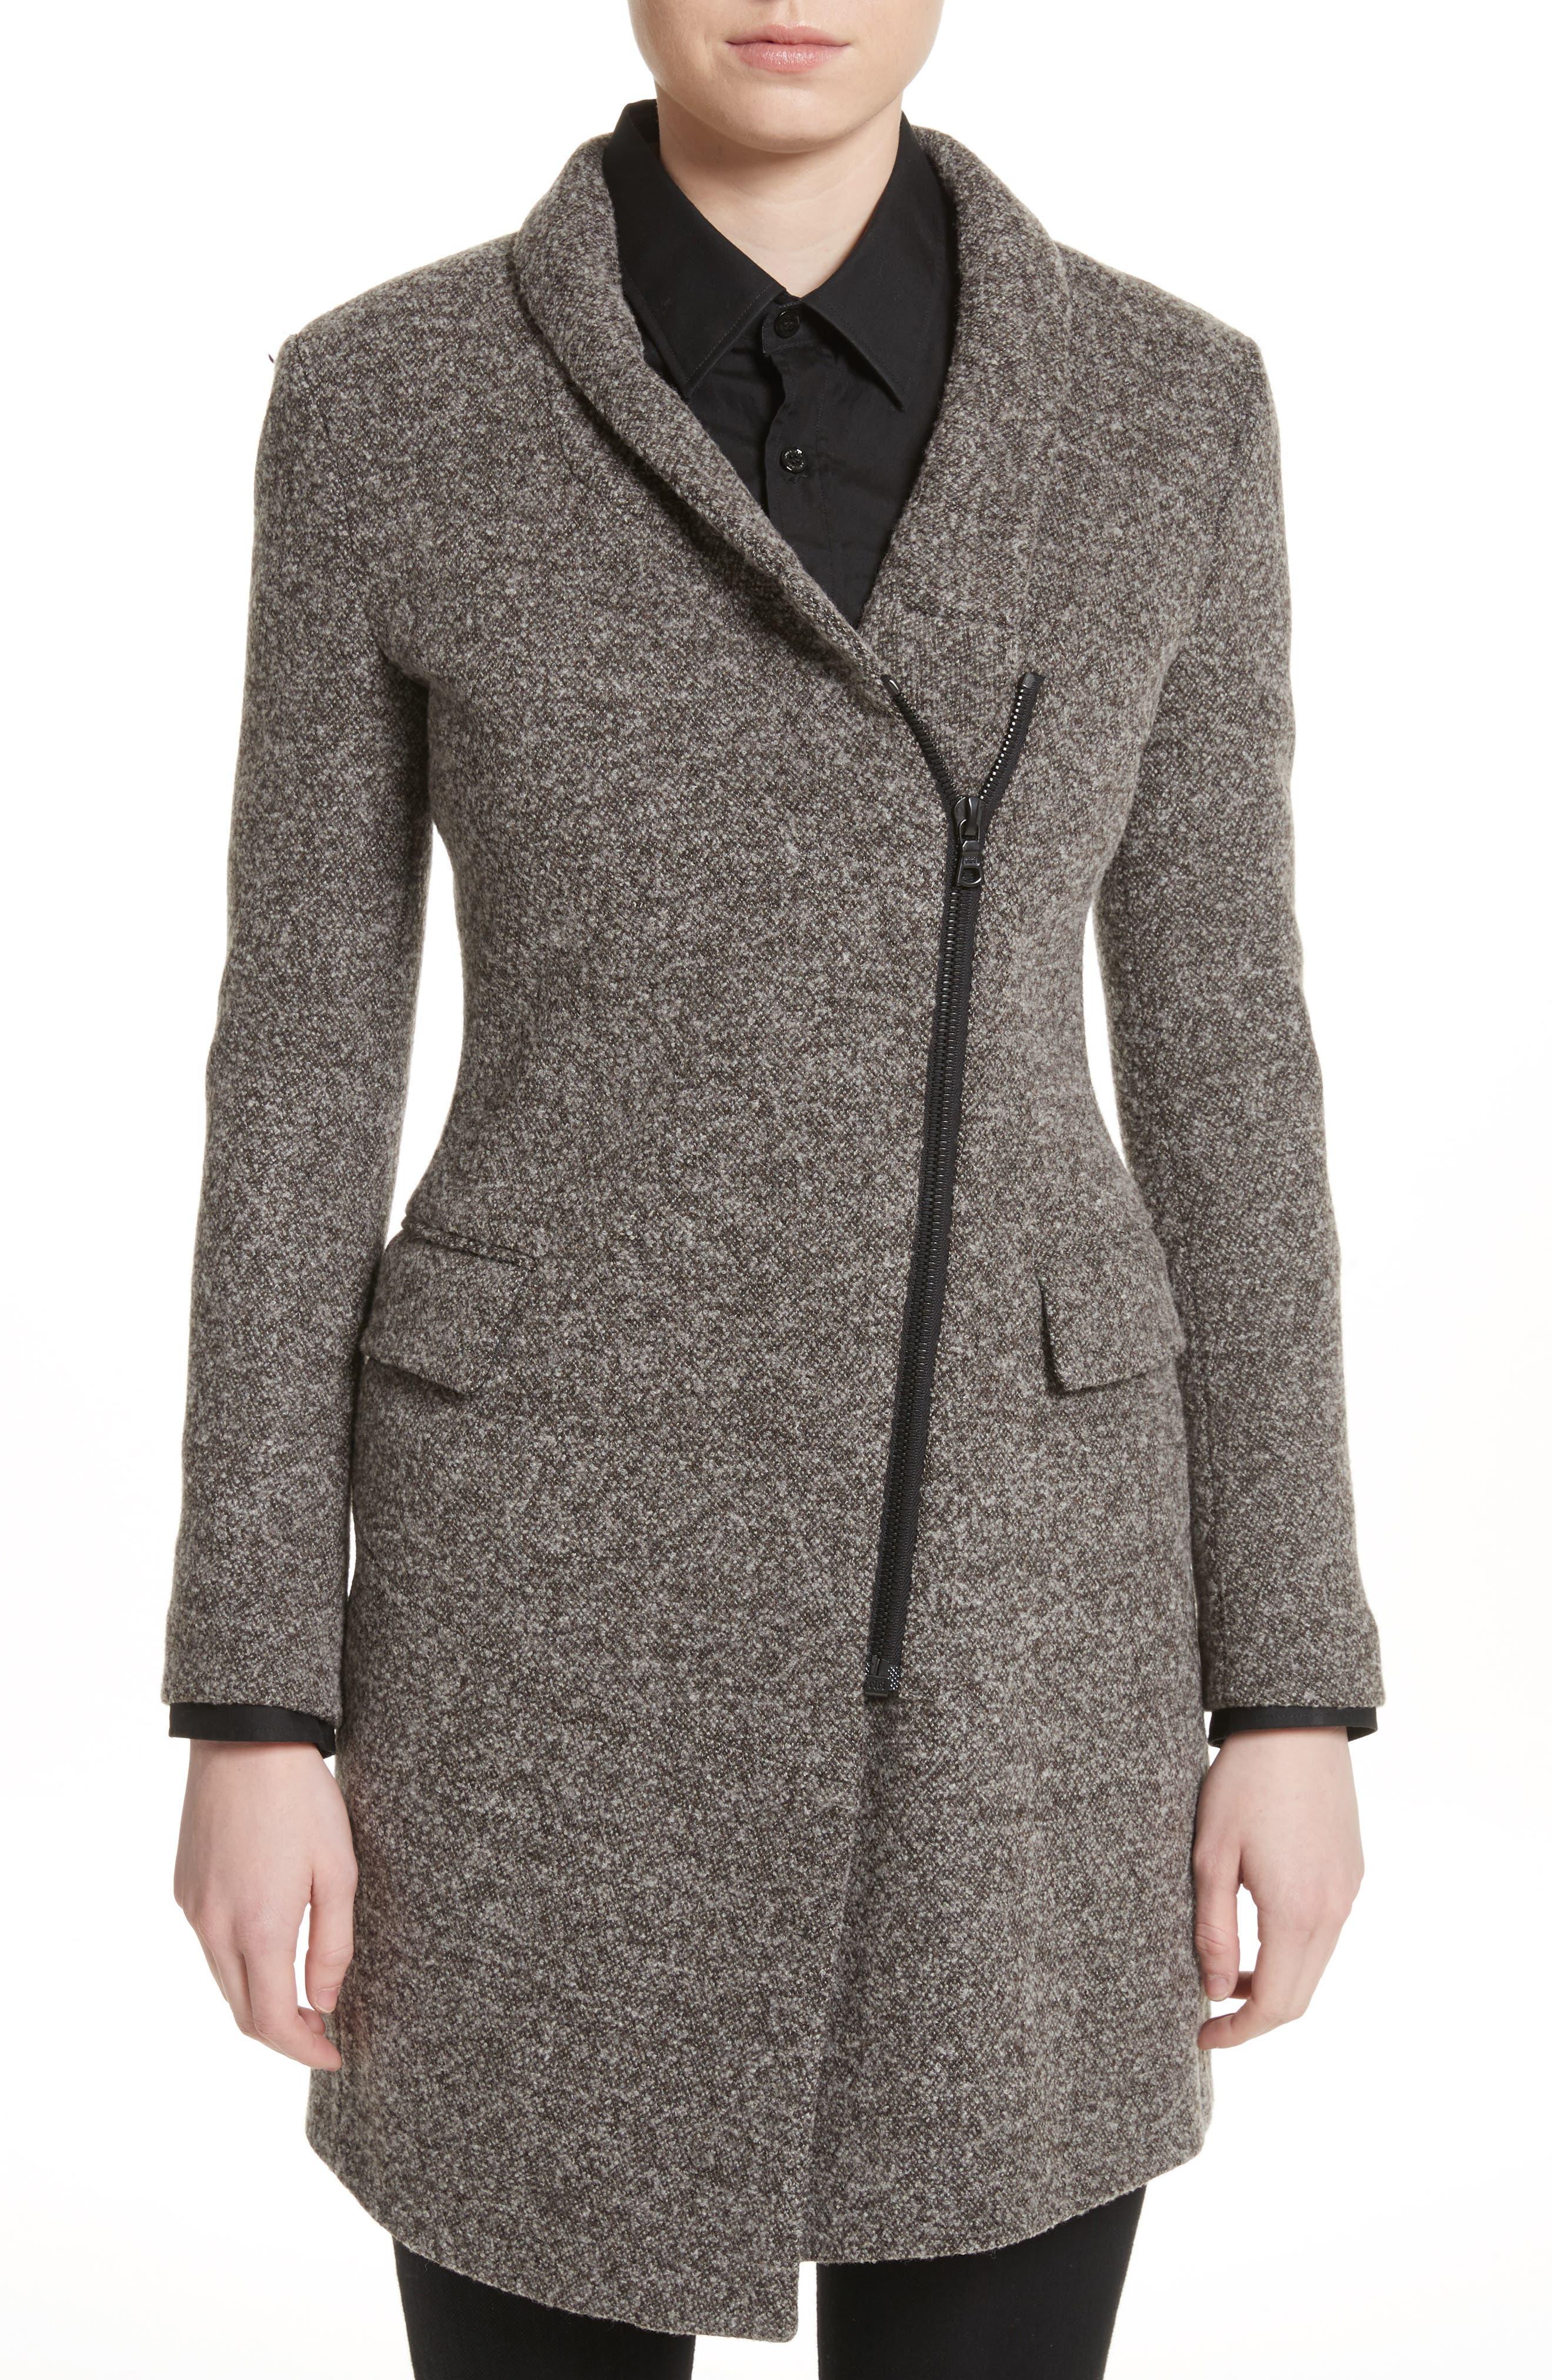 Atlein Jersey Galaxy Tweed Jacket (Nordstrom Exclusive)